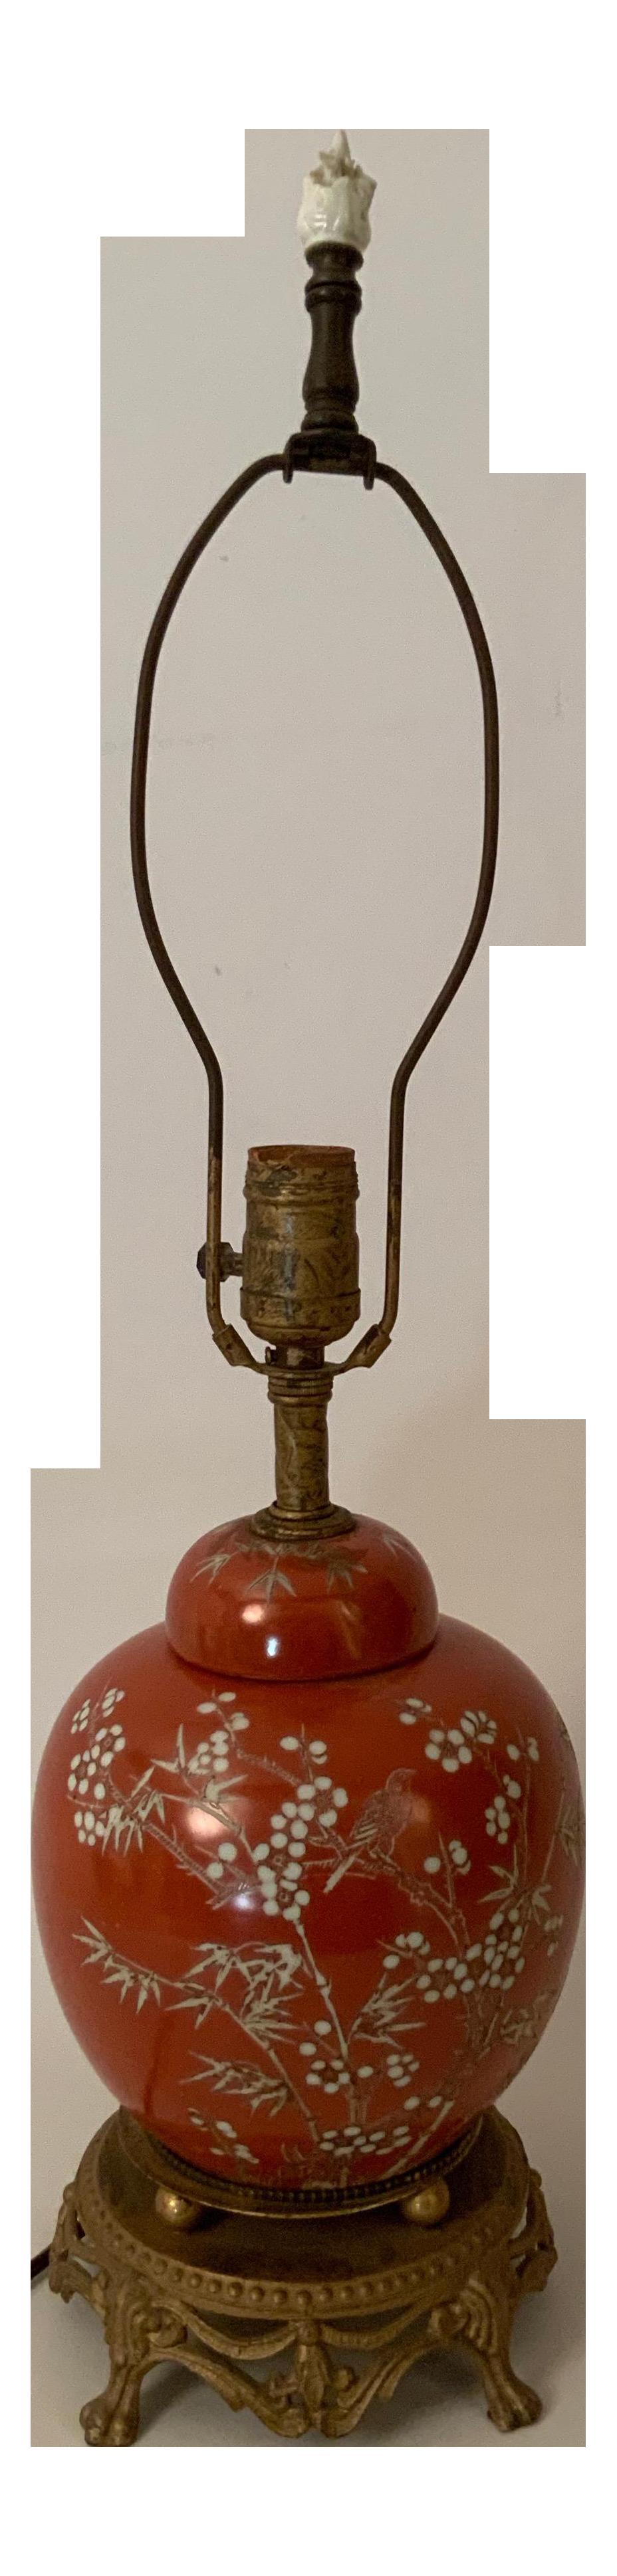 1930s Chinese Ginger Jar Table Lamp Chairish